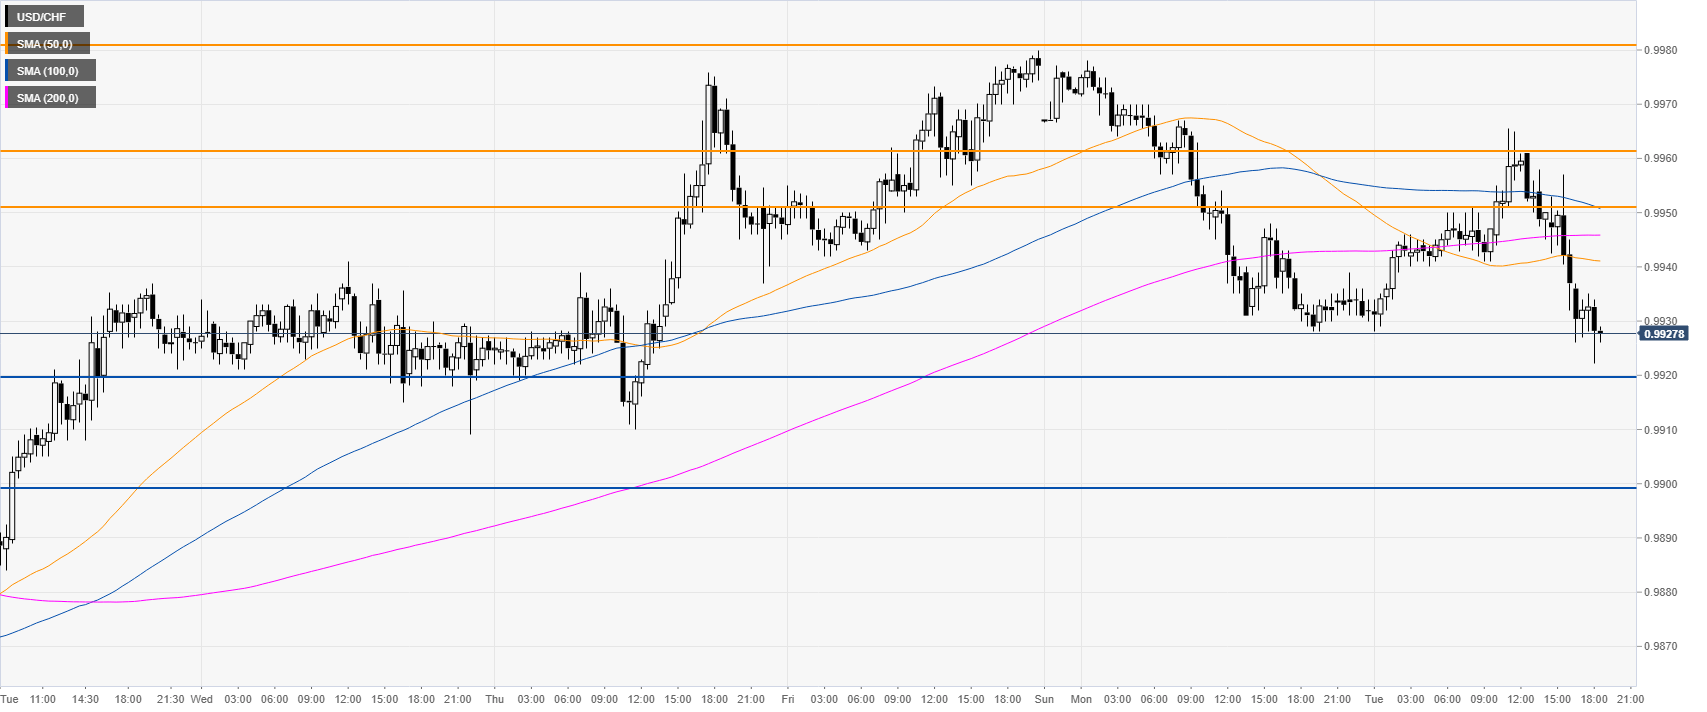 USD/CHF 30-minute chart